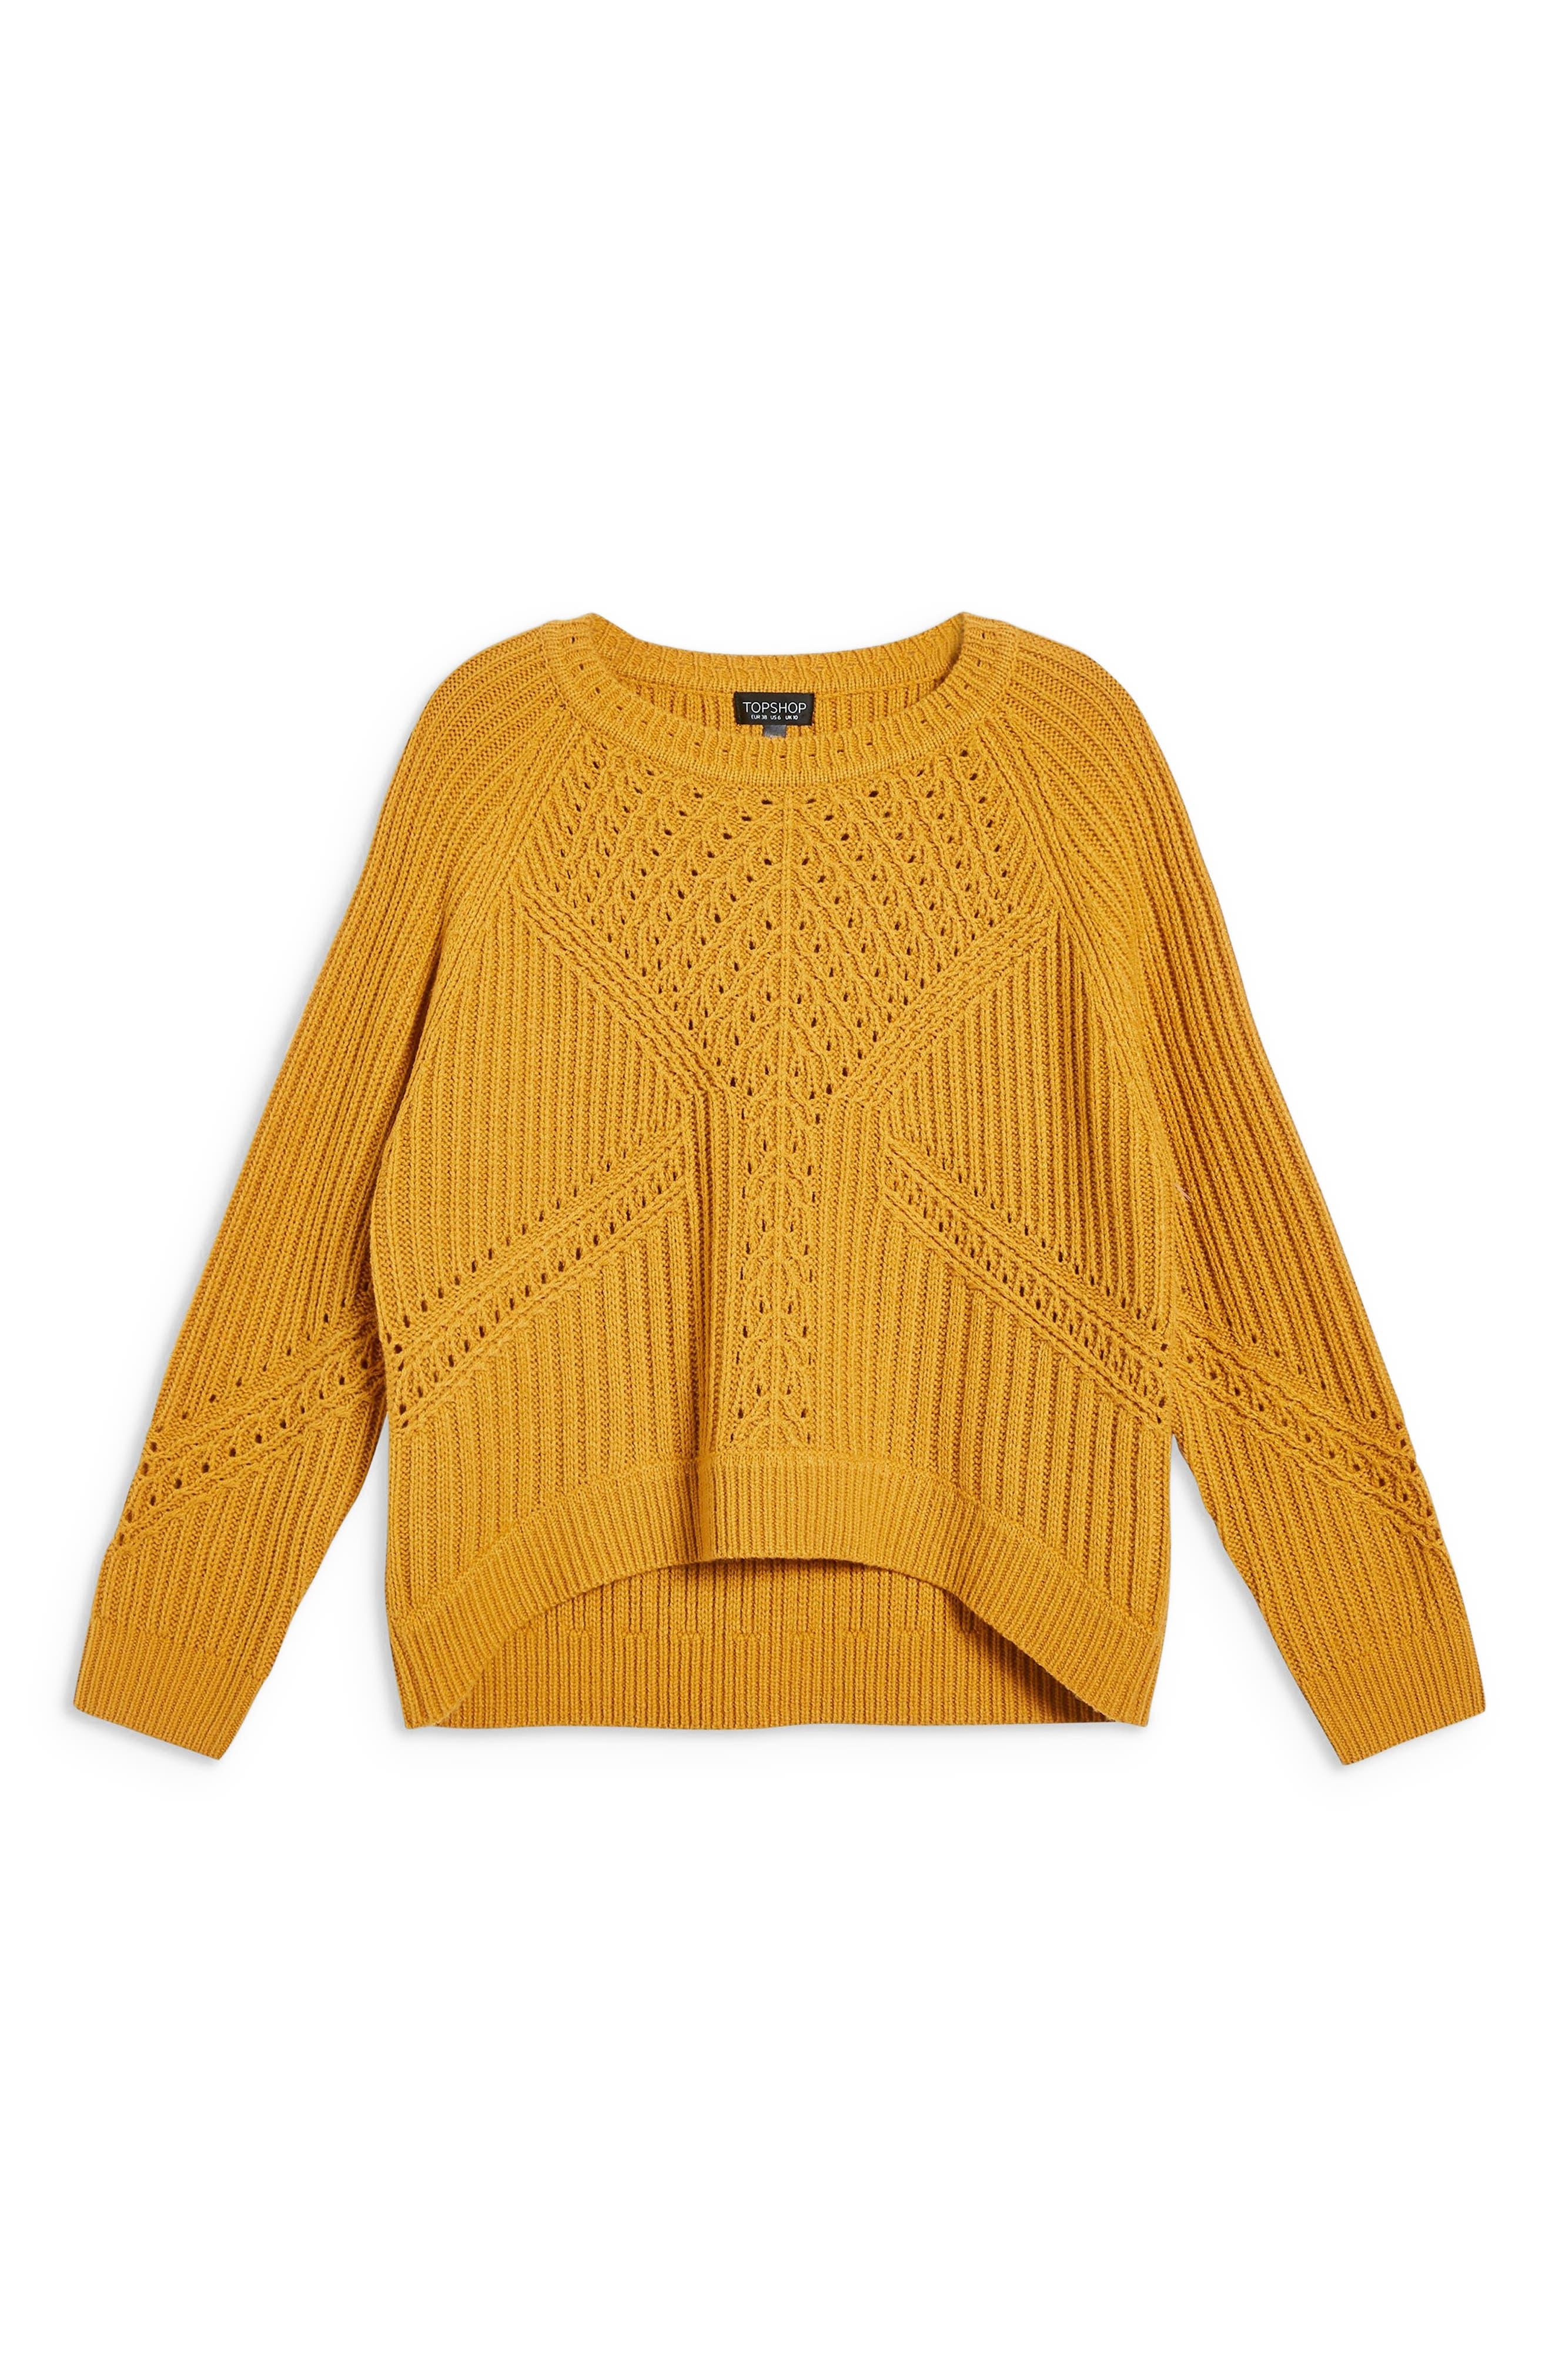 Rib & Pointelle Stitch Sweater,                             Alternate thumbnail 3, color,                             MUSTARD